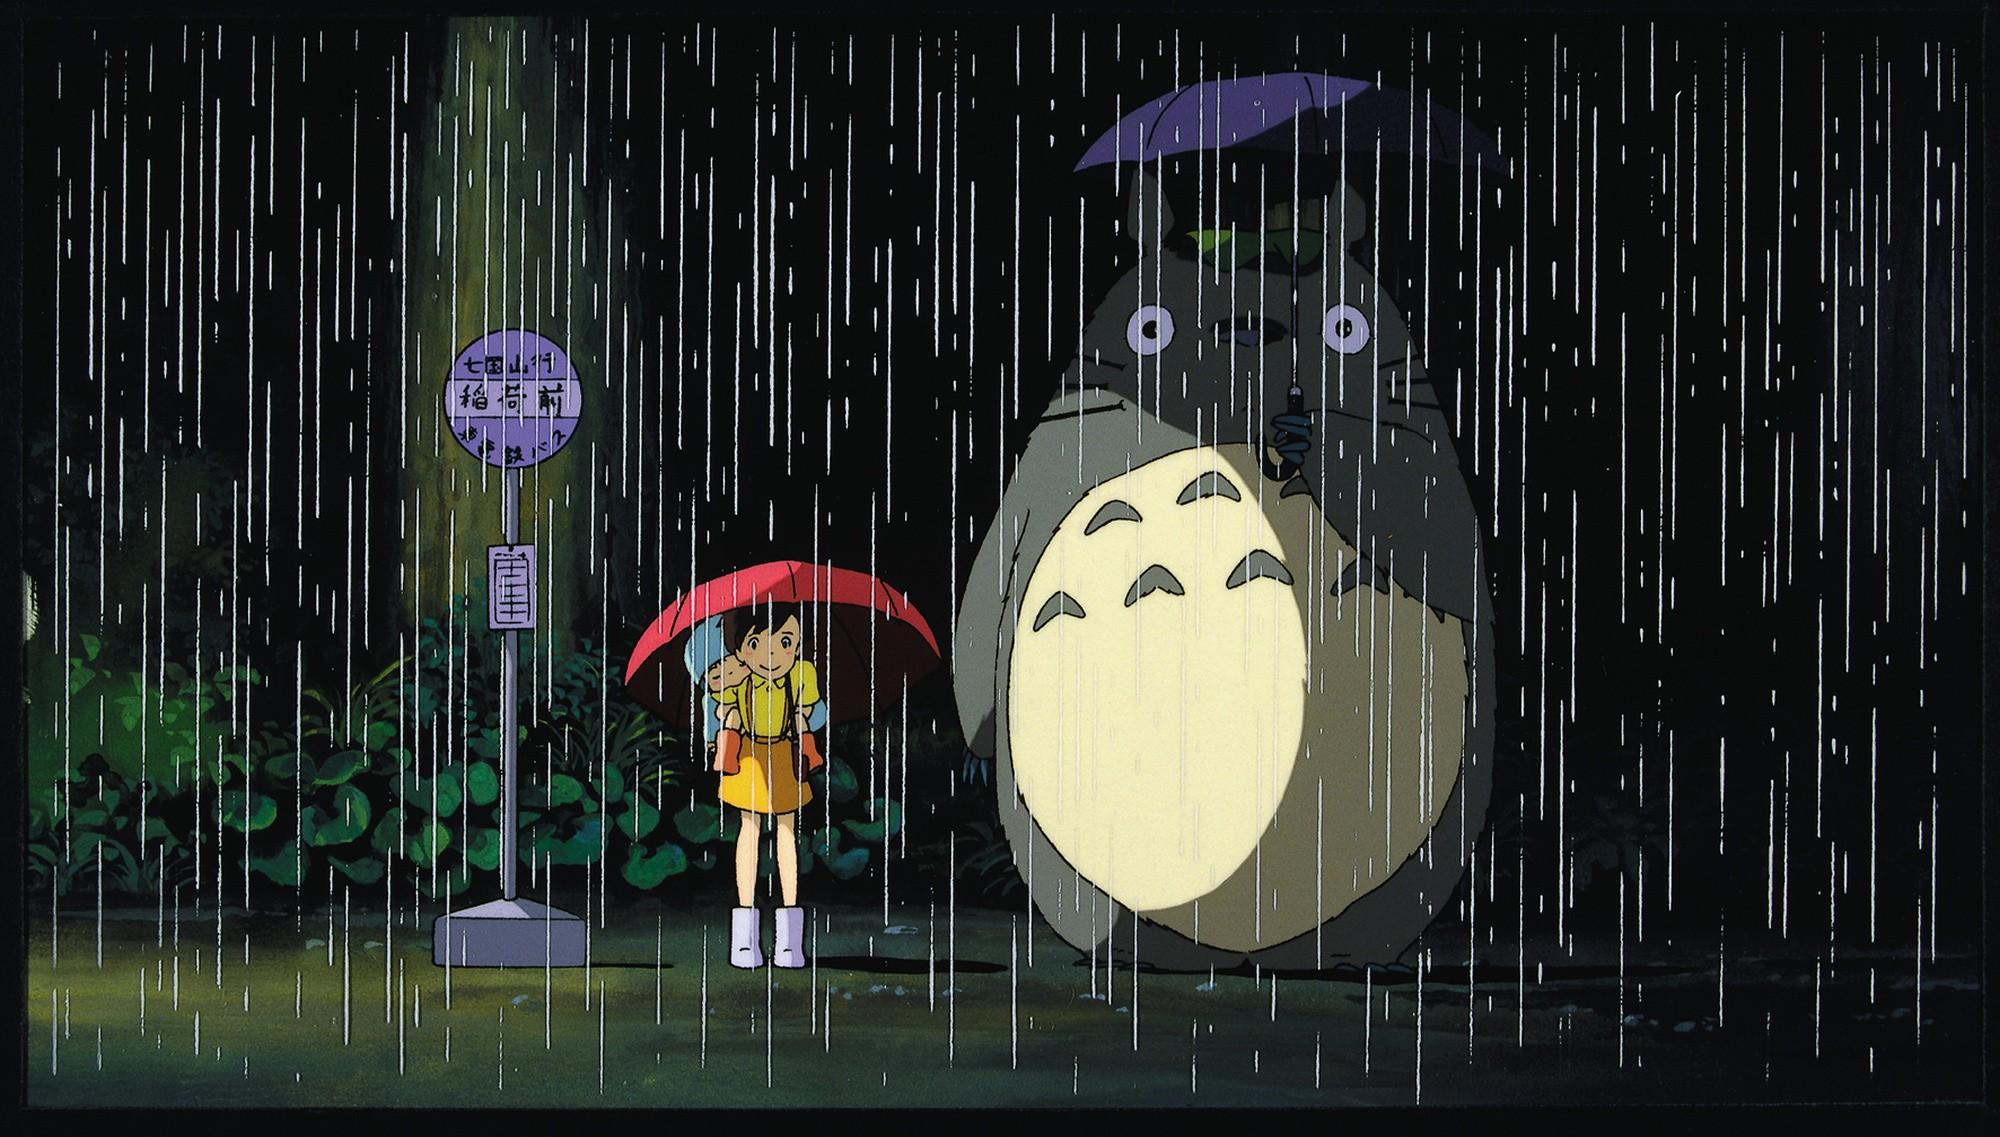 Anime 2000x1137 anime Studio Ghibli My Neighbor Totoro